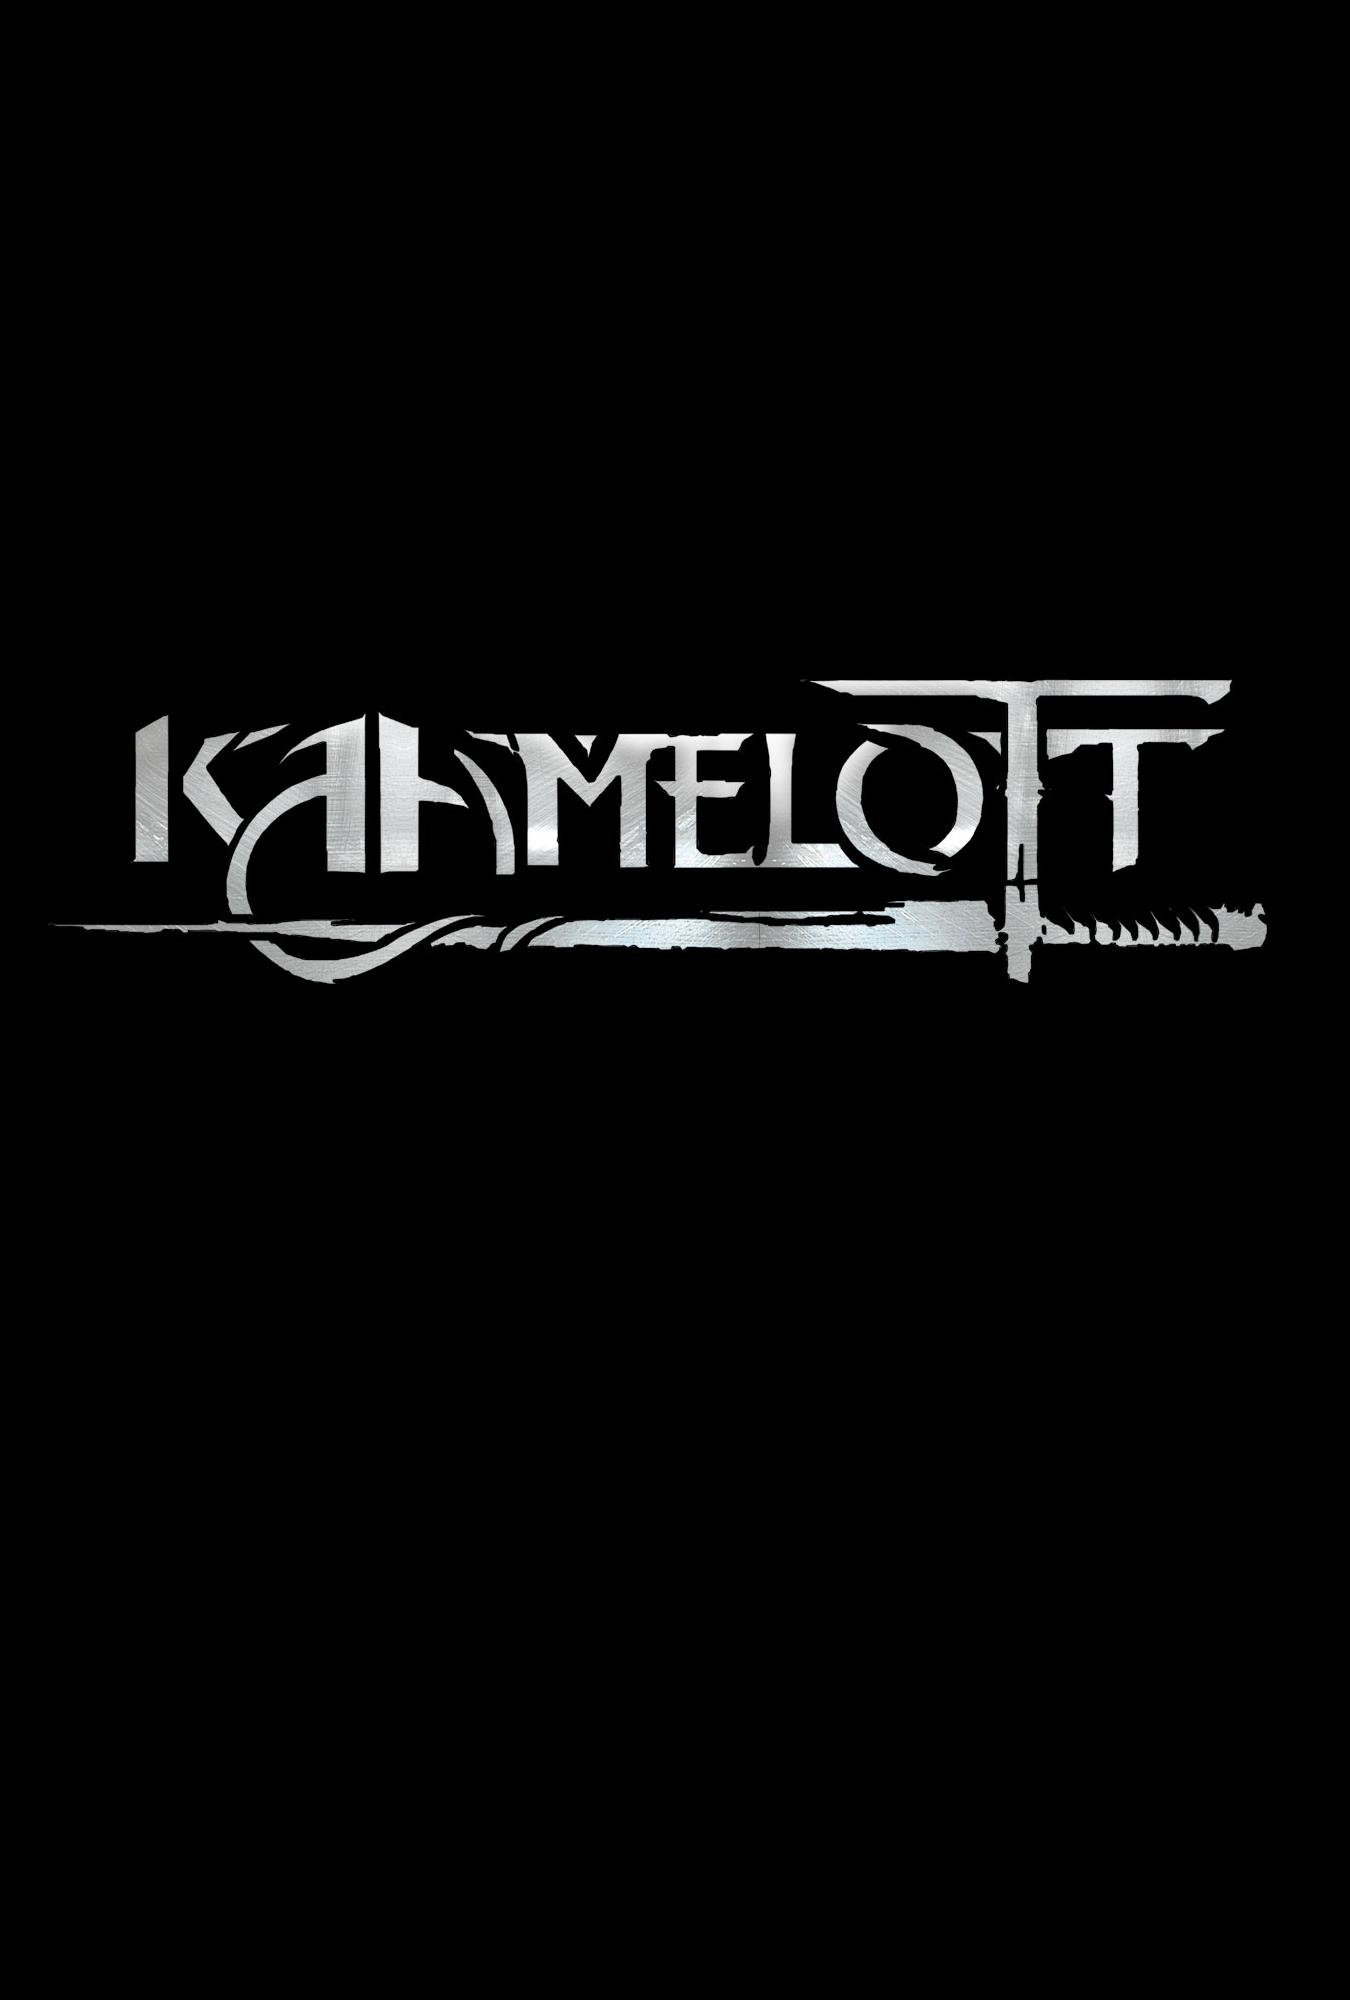 Kaamelott Tv Series 2004 Imdb Lanccelot Watch Aegis Of Attilia